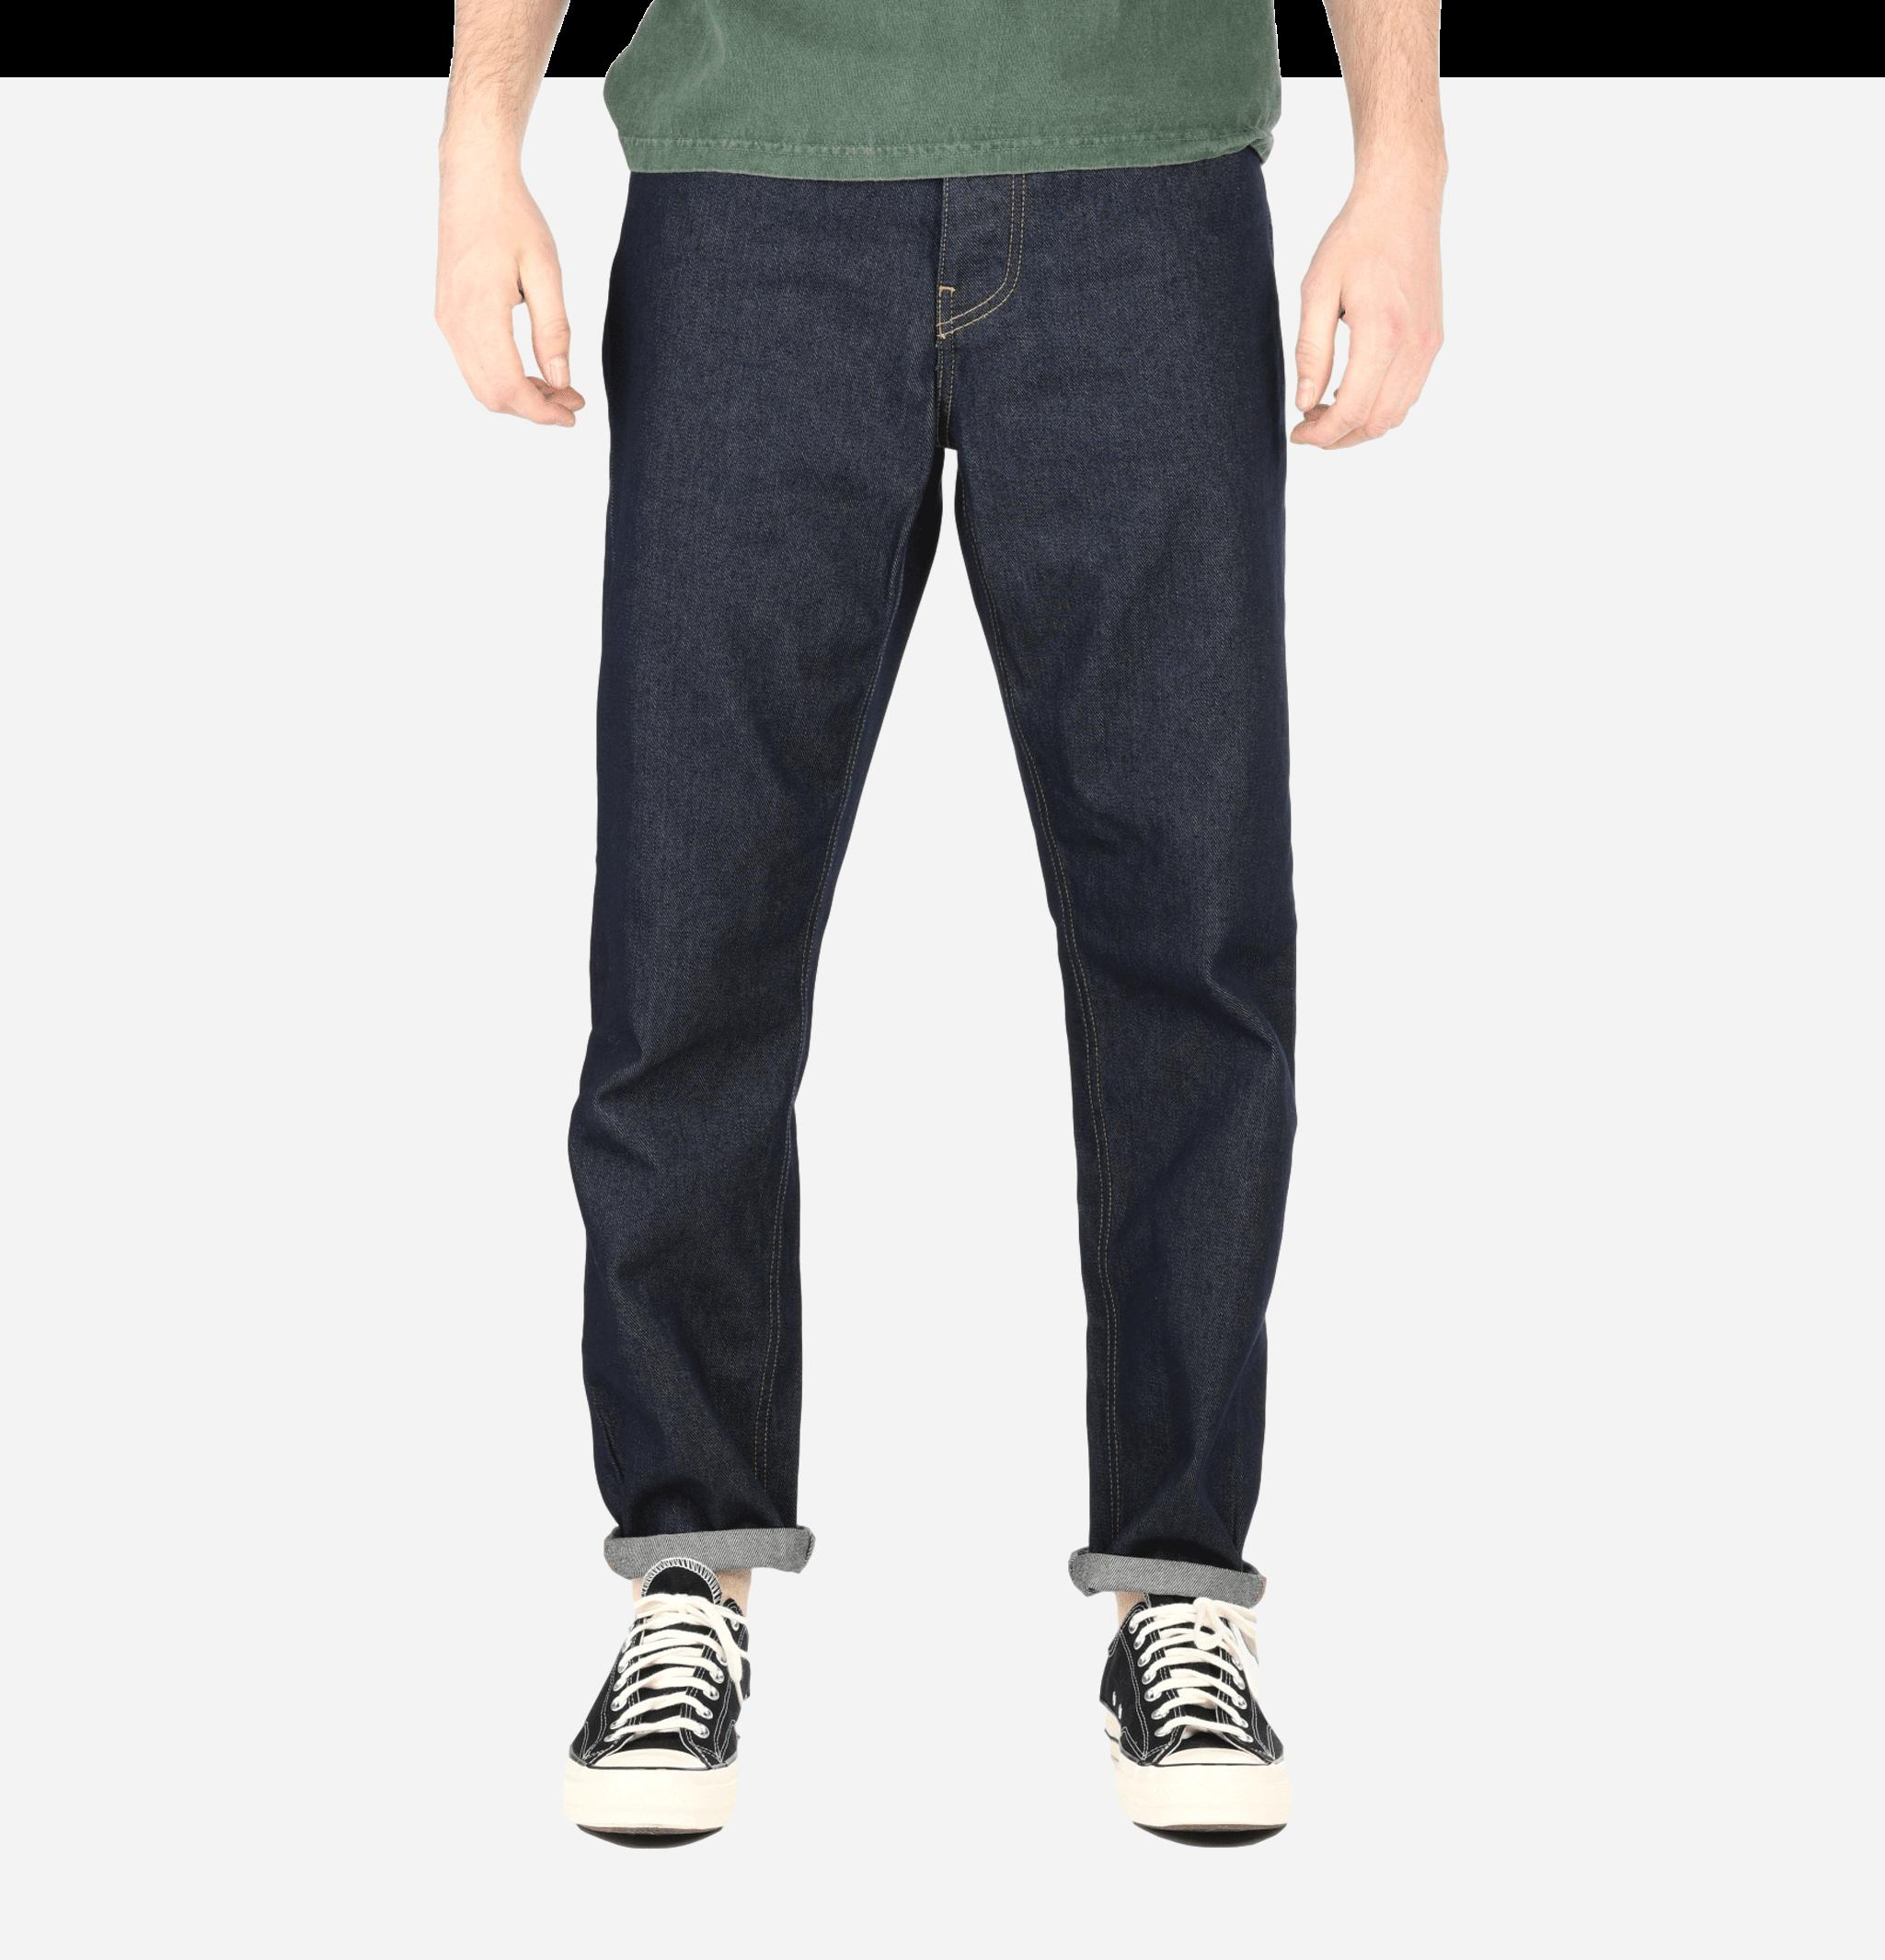 Newel Jeans Blue Rinse